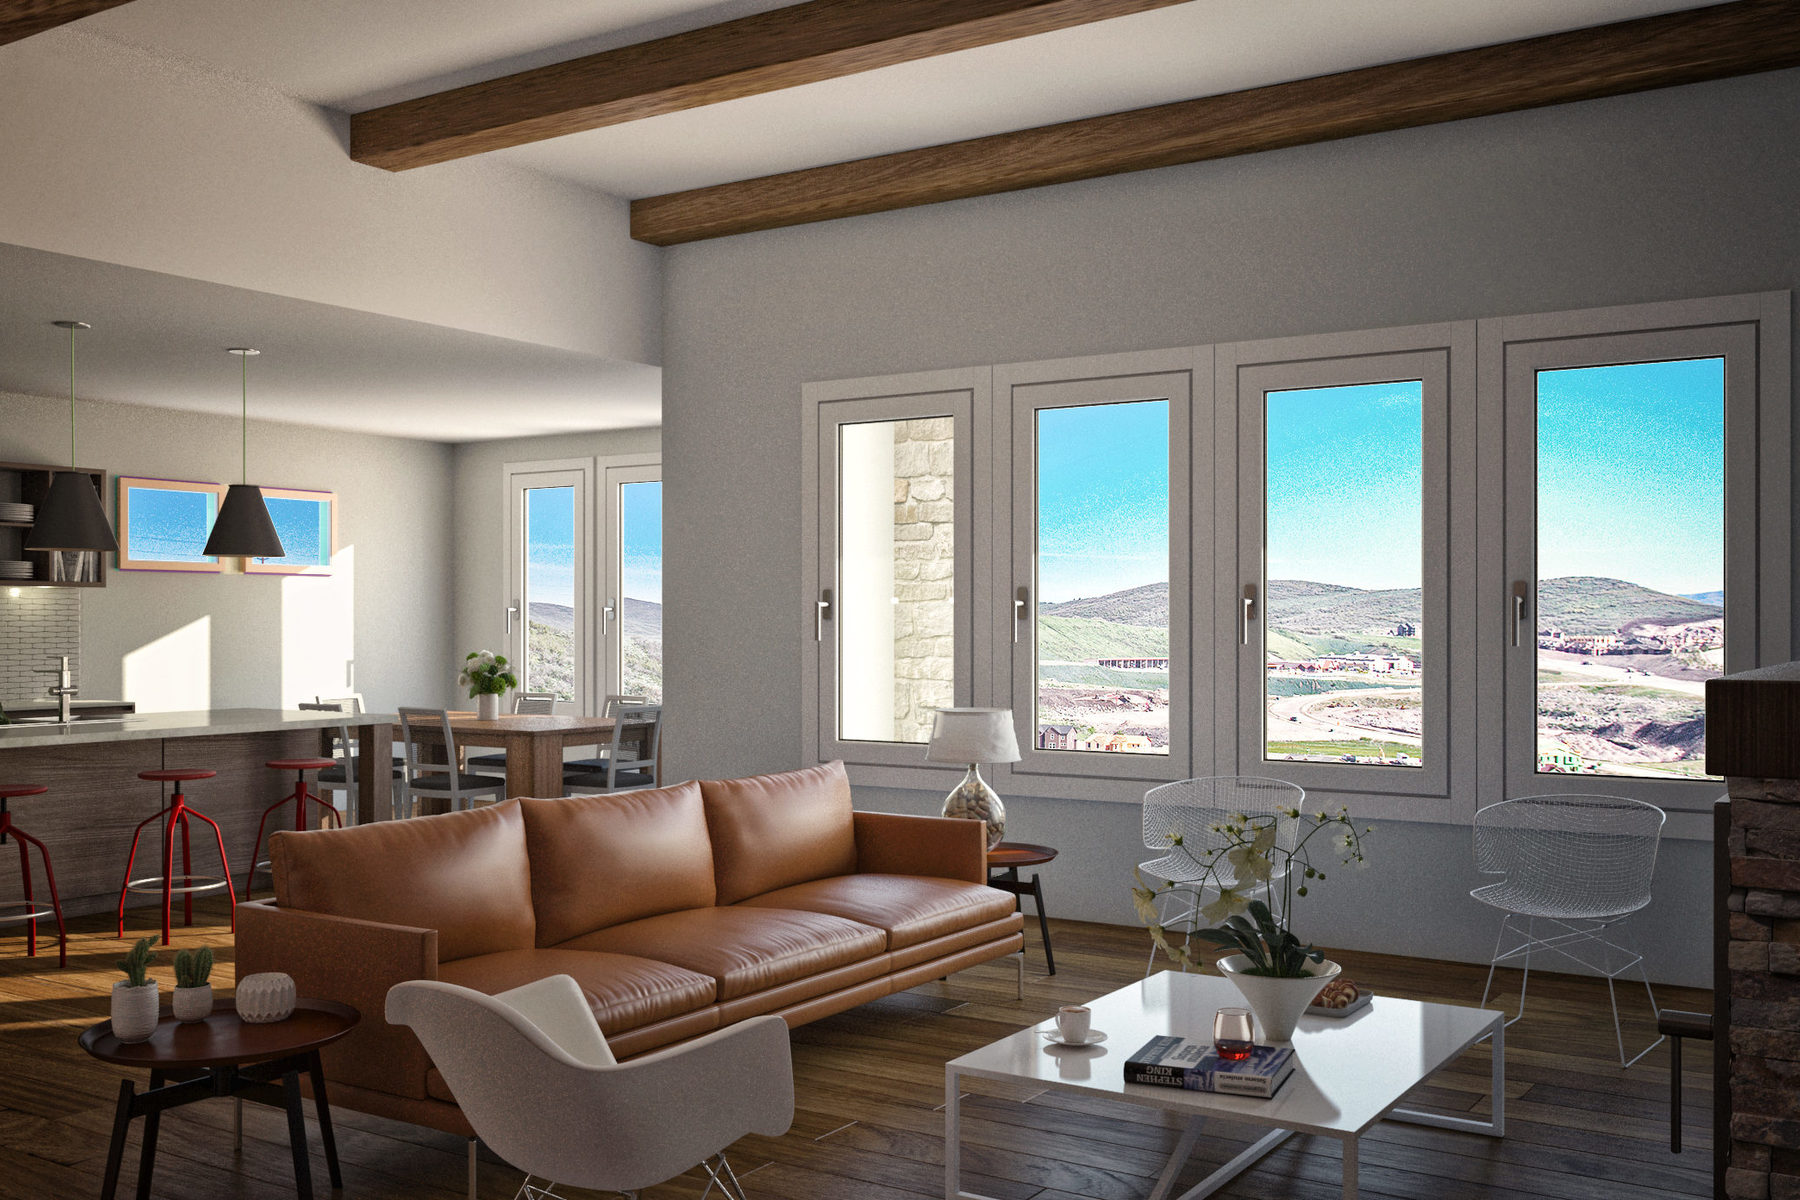 独户住宅 为 销售 在 Amazing Value SF Home - A Must See! 13205 E Alexis Dr 希伯城, 犹他州, 84032 美国